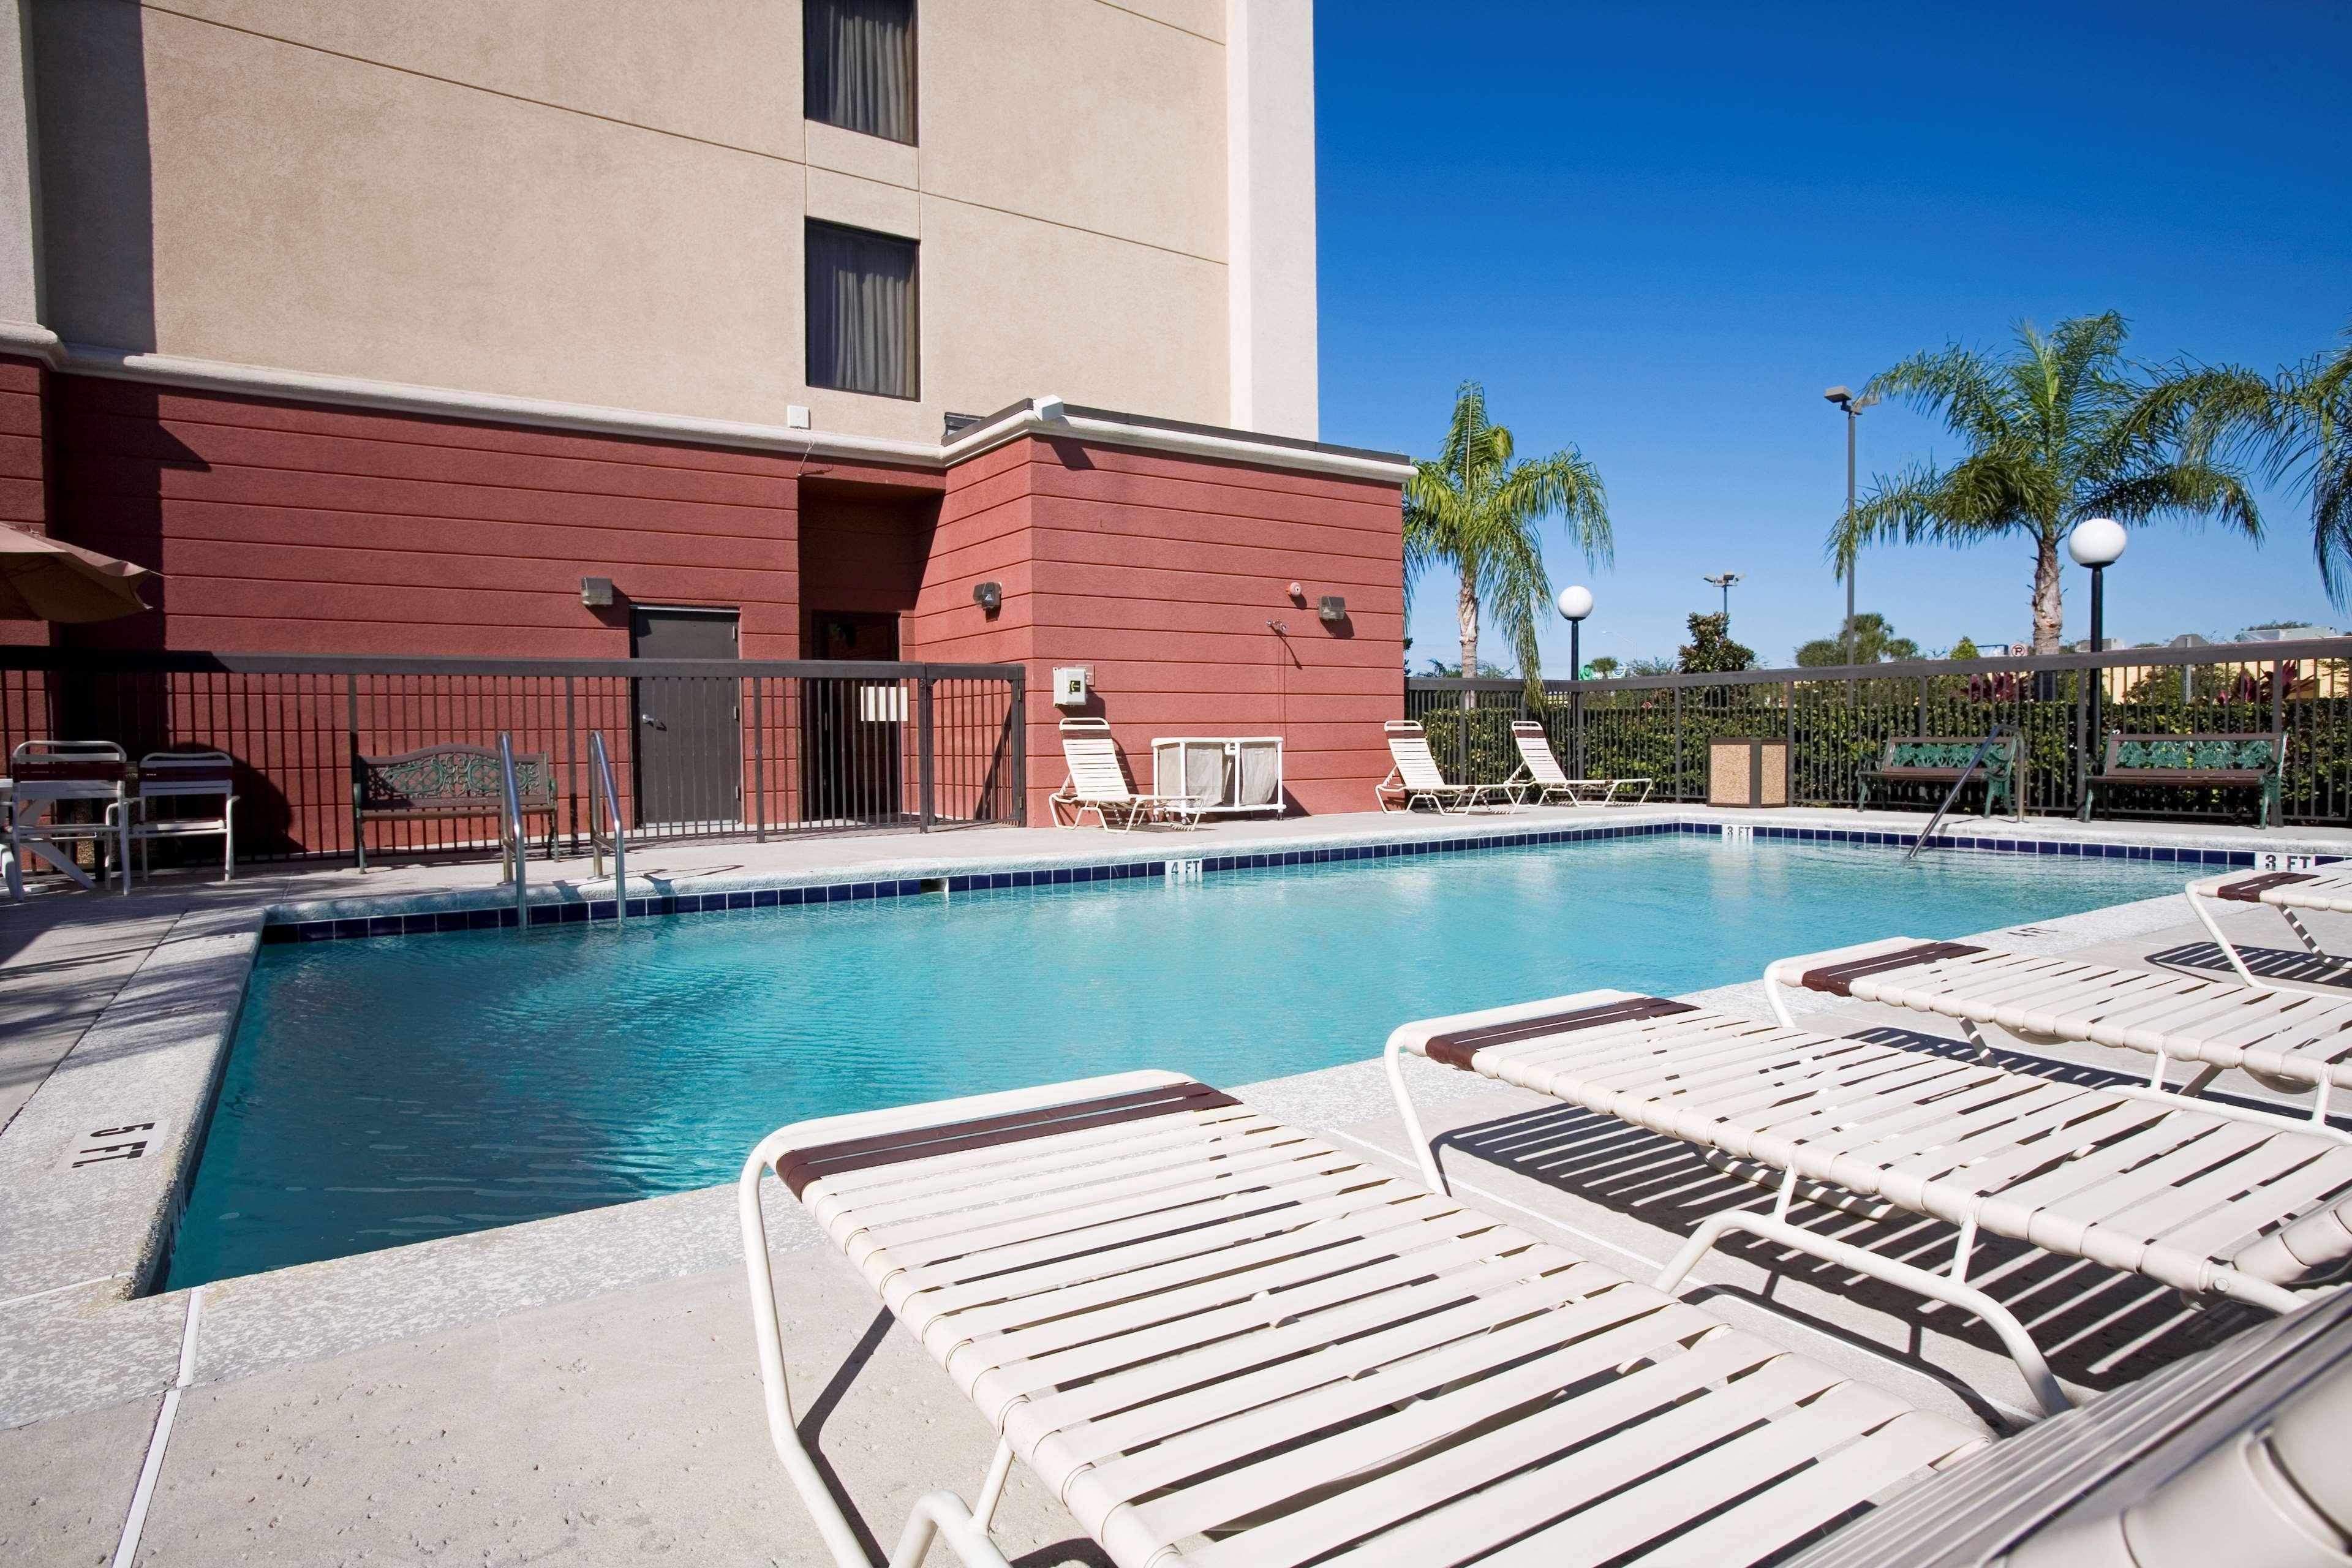 Hampton Inn & Suites Orlando Intl Dr N image 5